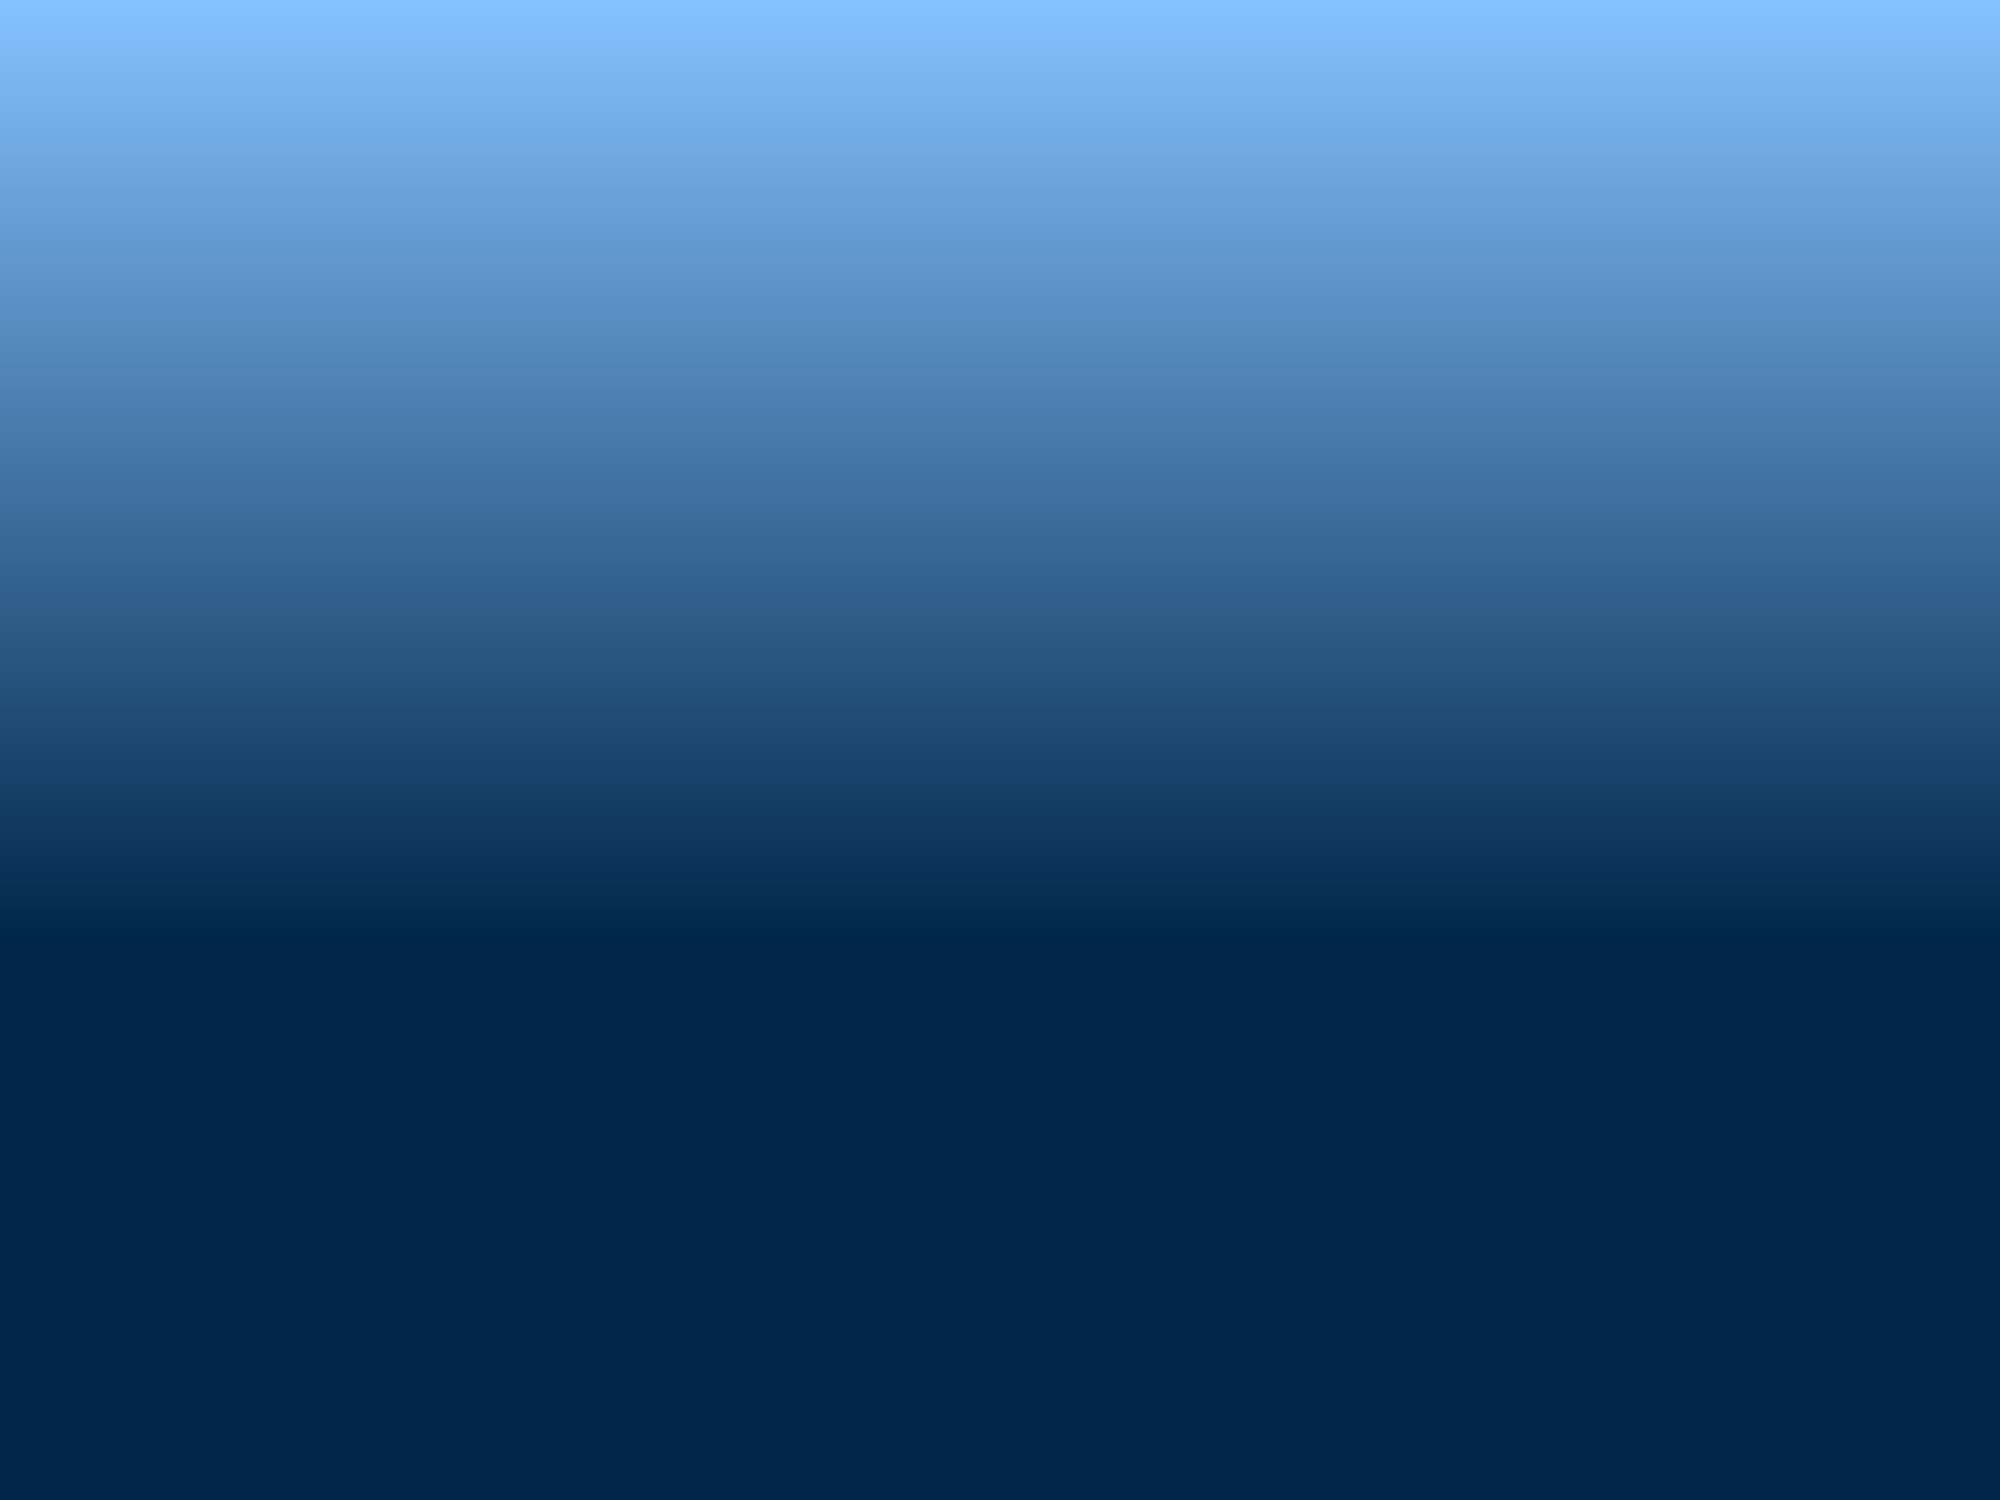 Blue gradient photo